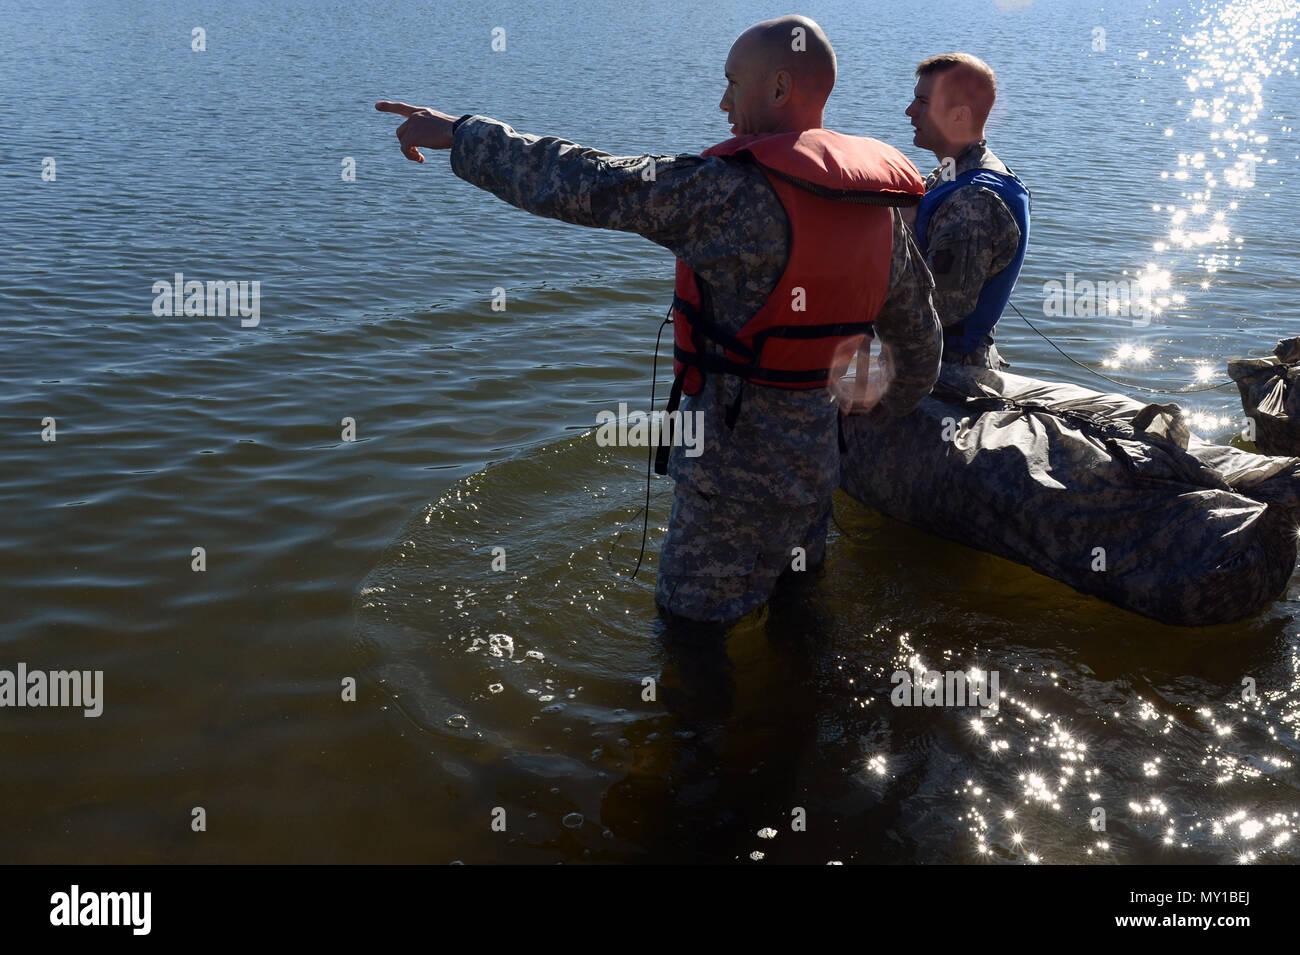 U S Army Staff Sgt Jon Stock Photos Amp U S Army Staff Sgt